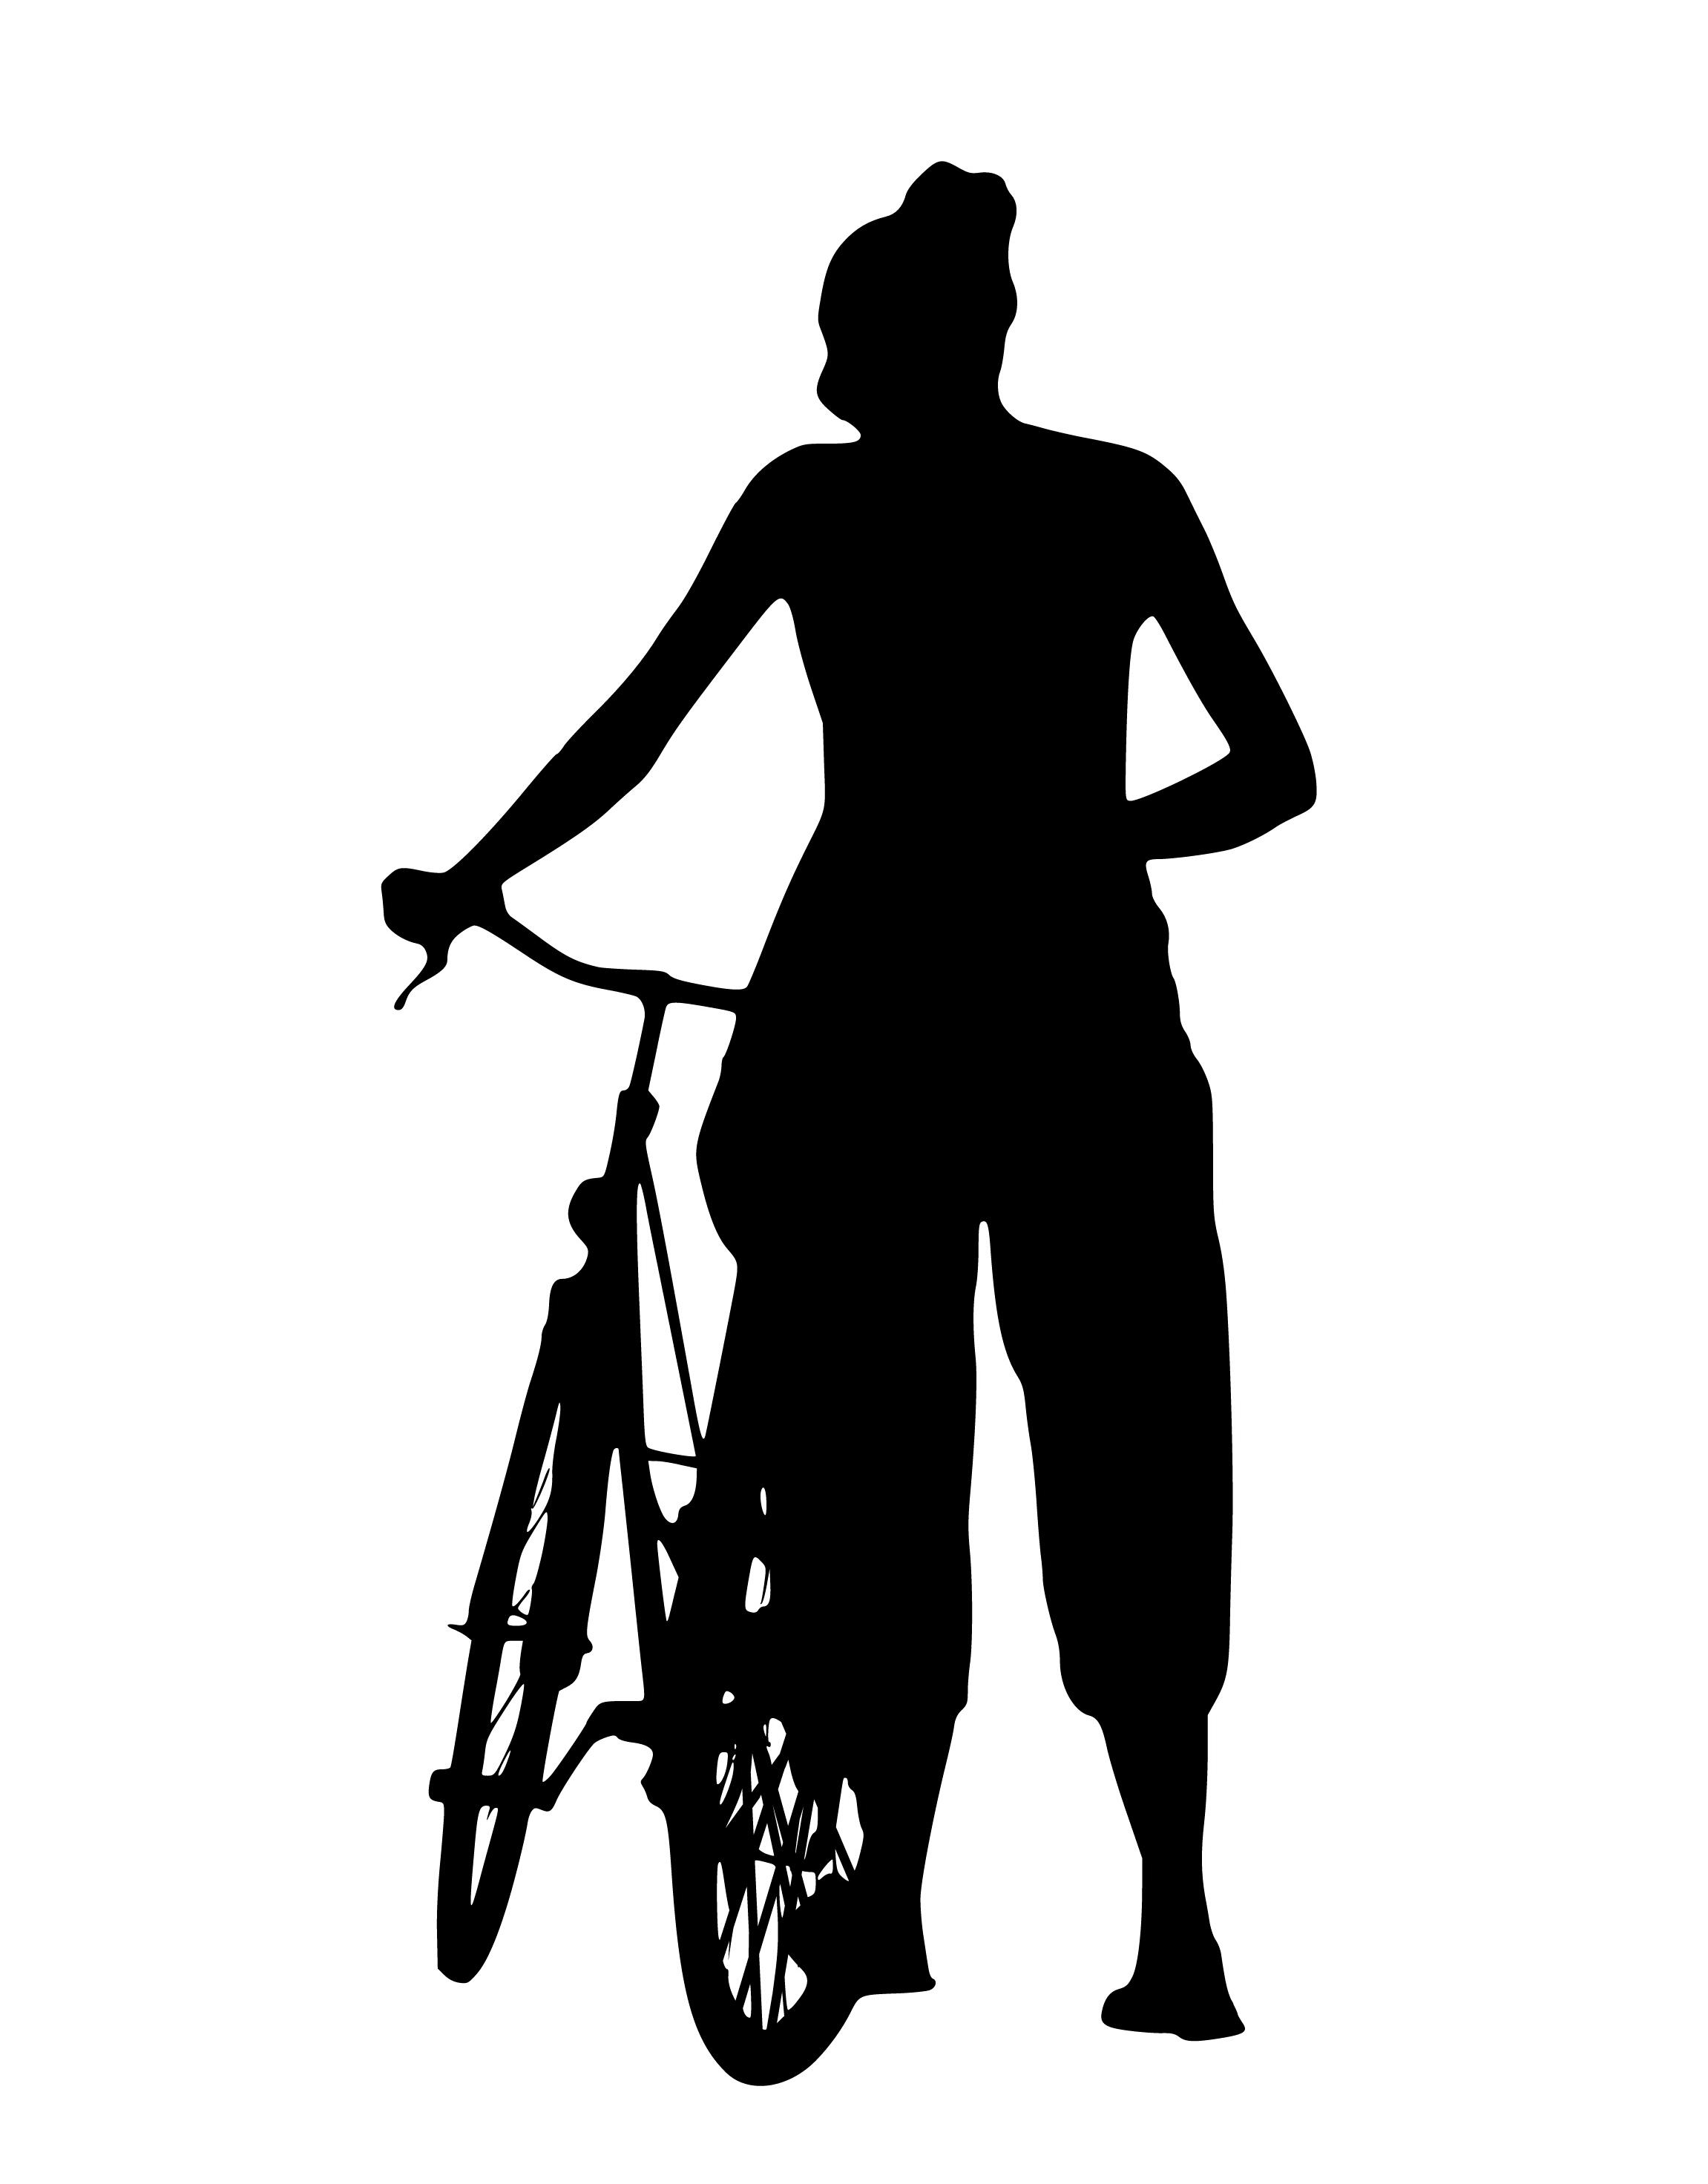 Fotos Gratis Silueta Niña Ciclismo Para Caminar Mujer Espalda